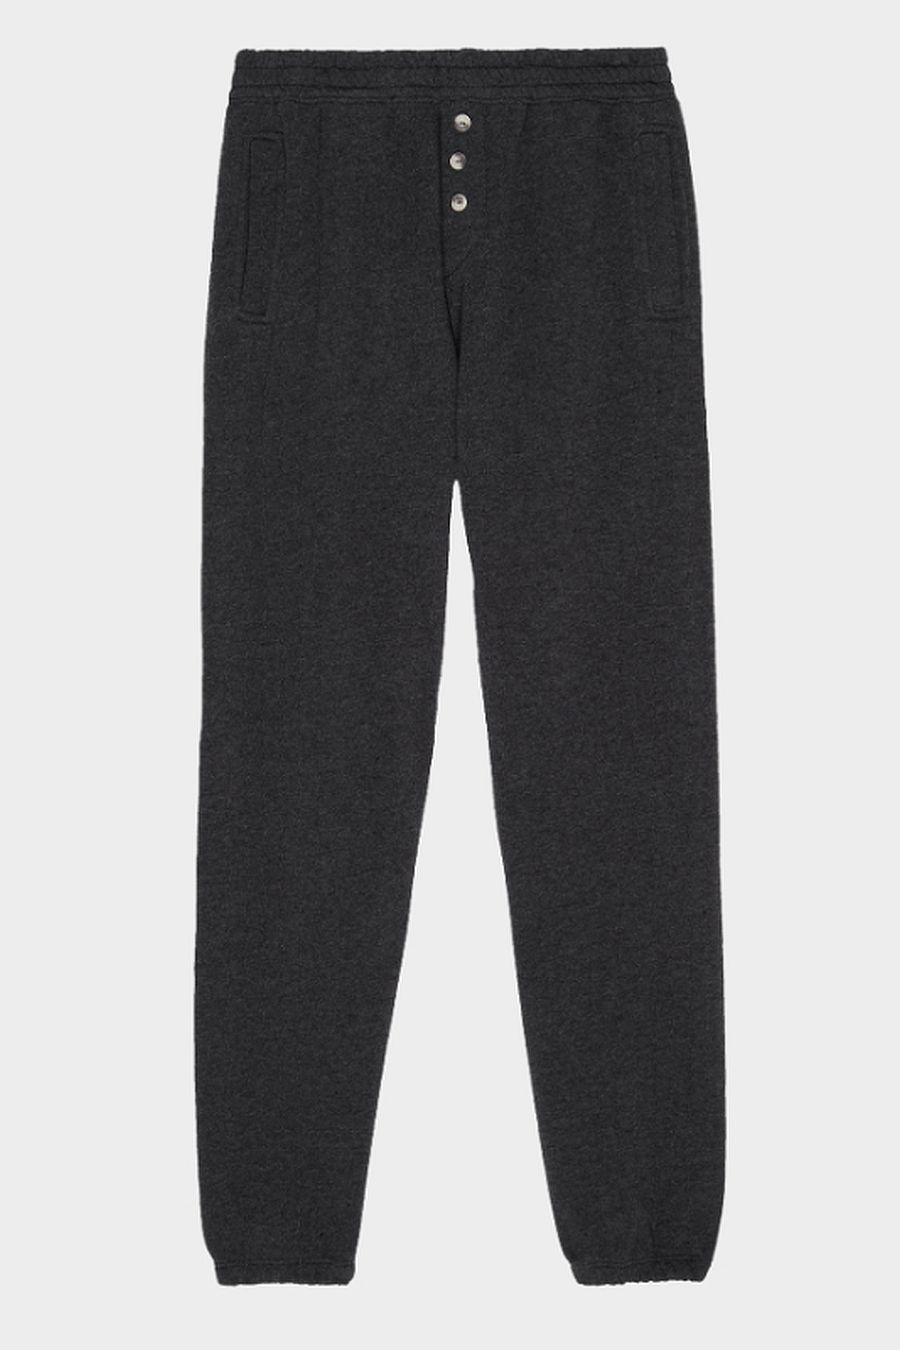 DONNI. Vintage Fleece Joggers - Charcoal